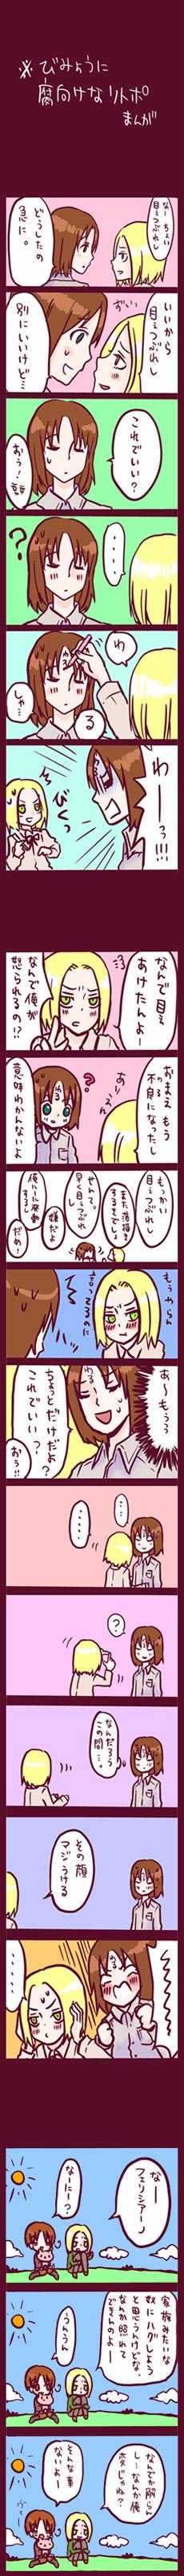 Tags: Anime, Axis Powers: Hetalia, Poland, North Italy, Lithuania, Pixiv, Comic, Mediterranean Countries, Soviet Union, Axis Power Countries